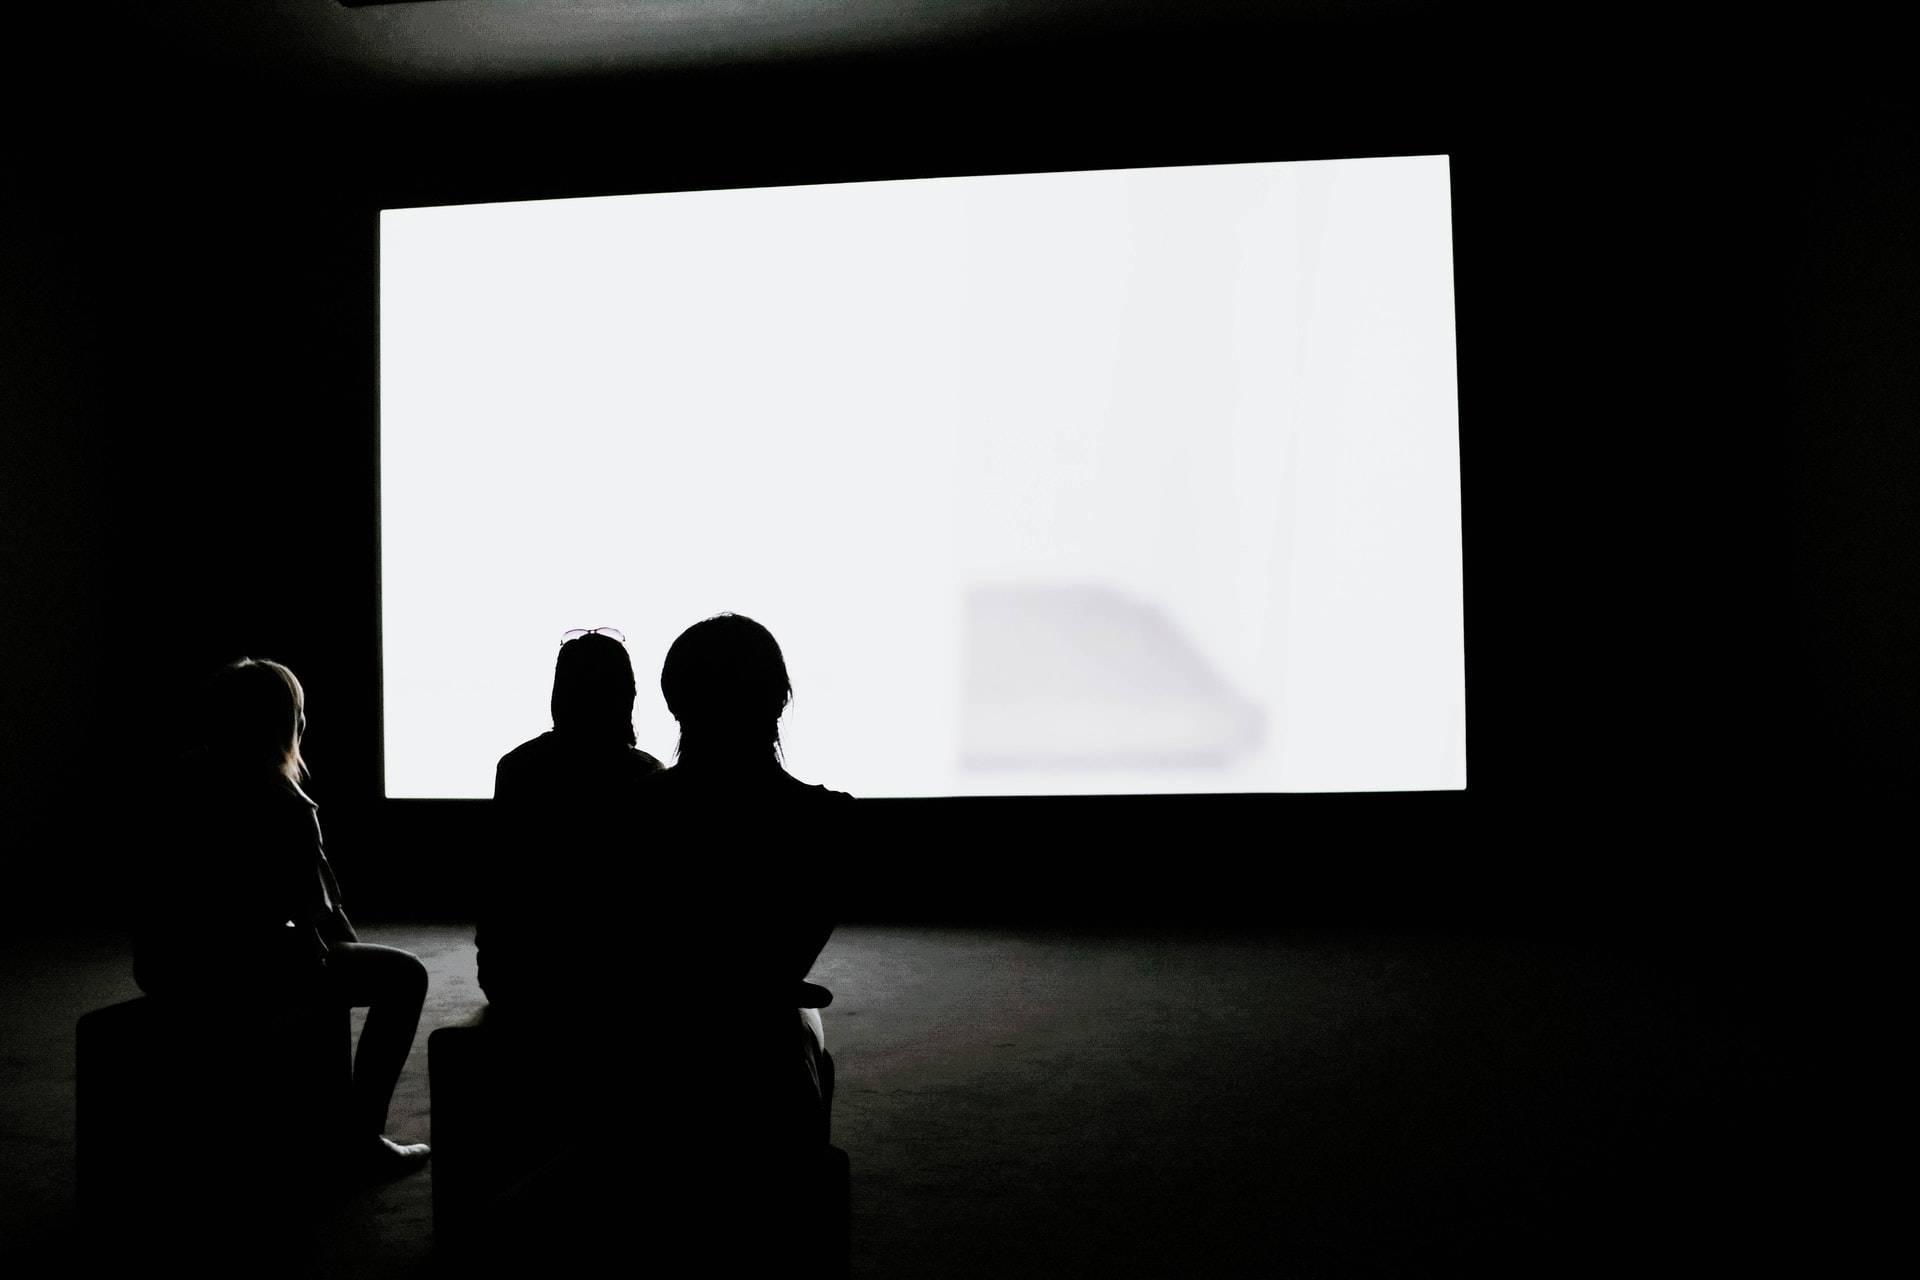 Video-Wall, @adrienolichon, unsplash.com